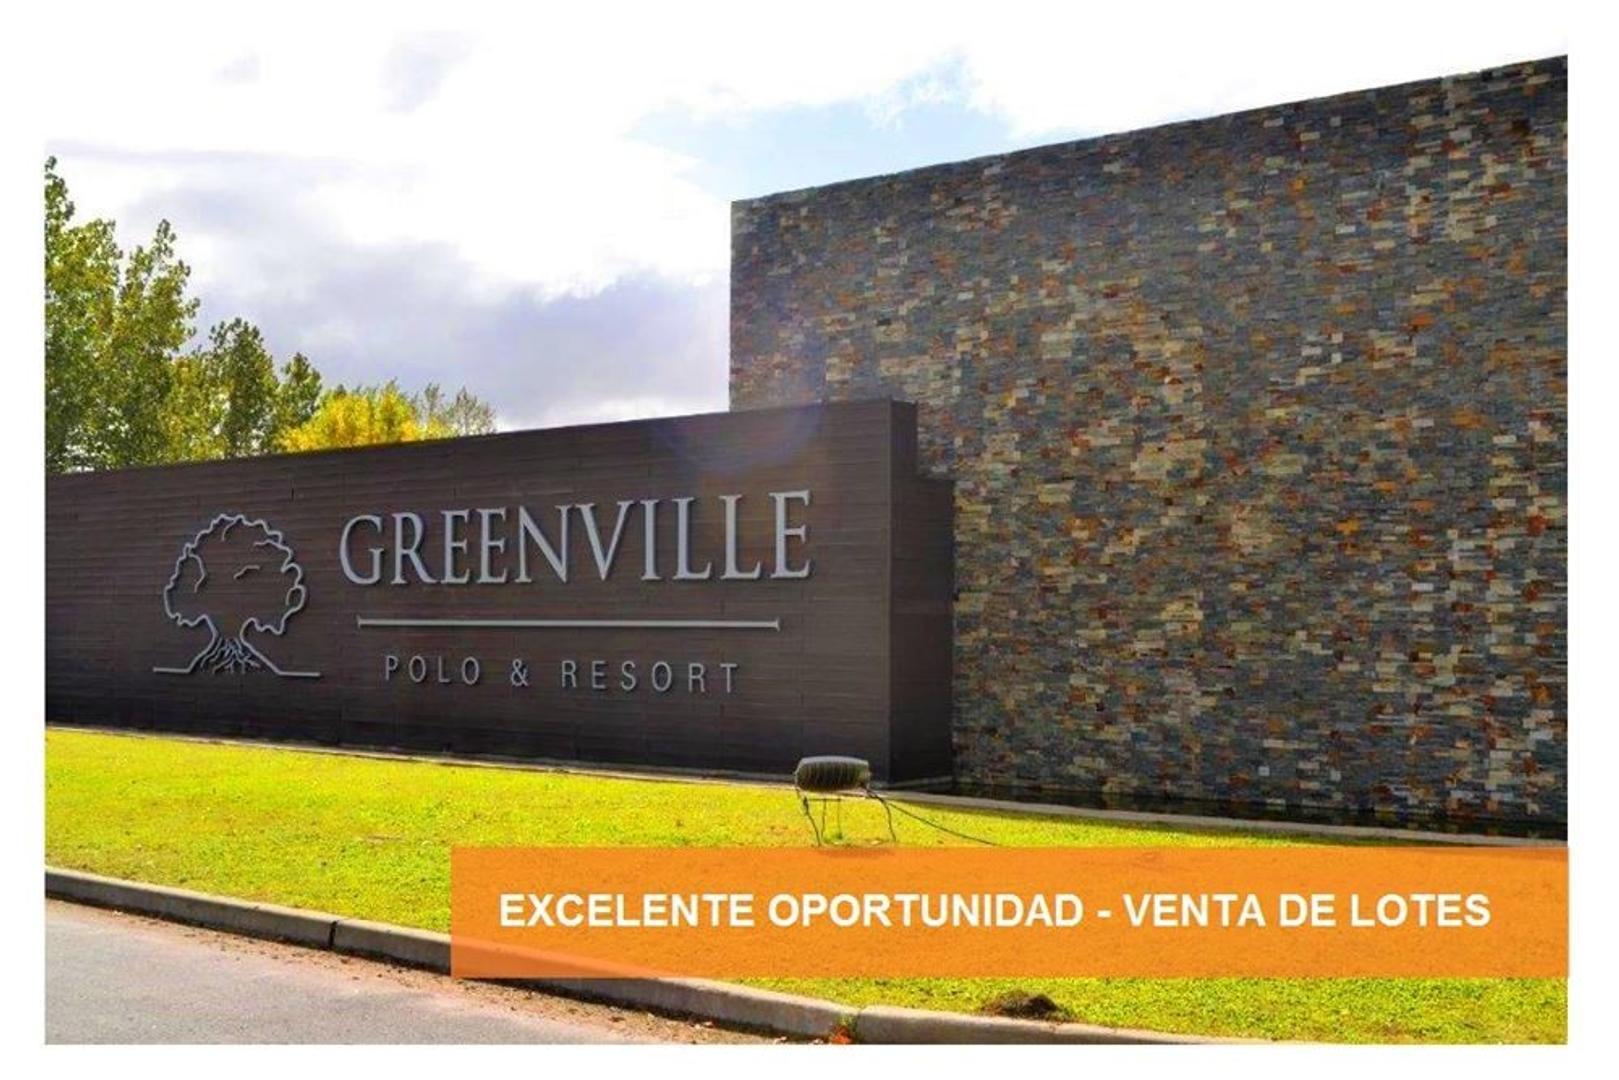 GREENVILLE POLO & RESORT - UN NUEVO CONCEPTO